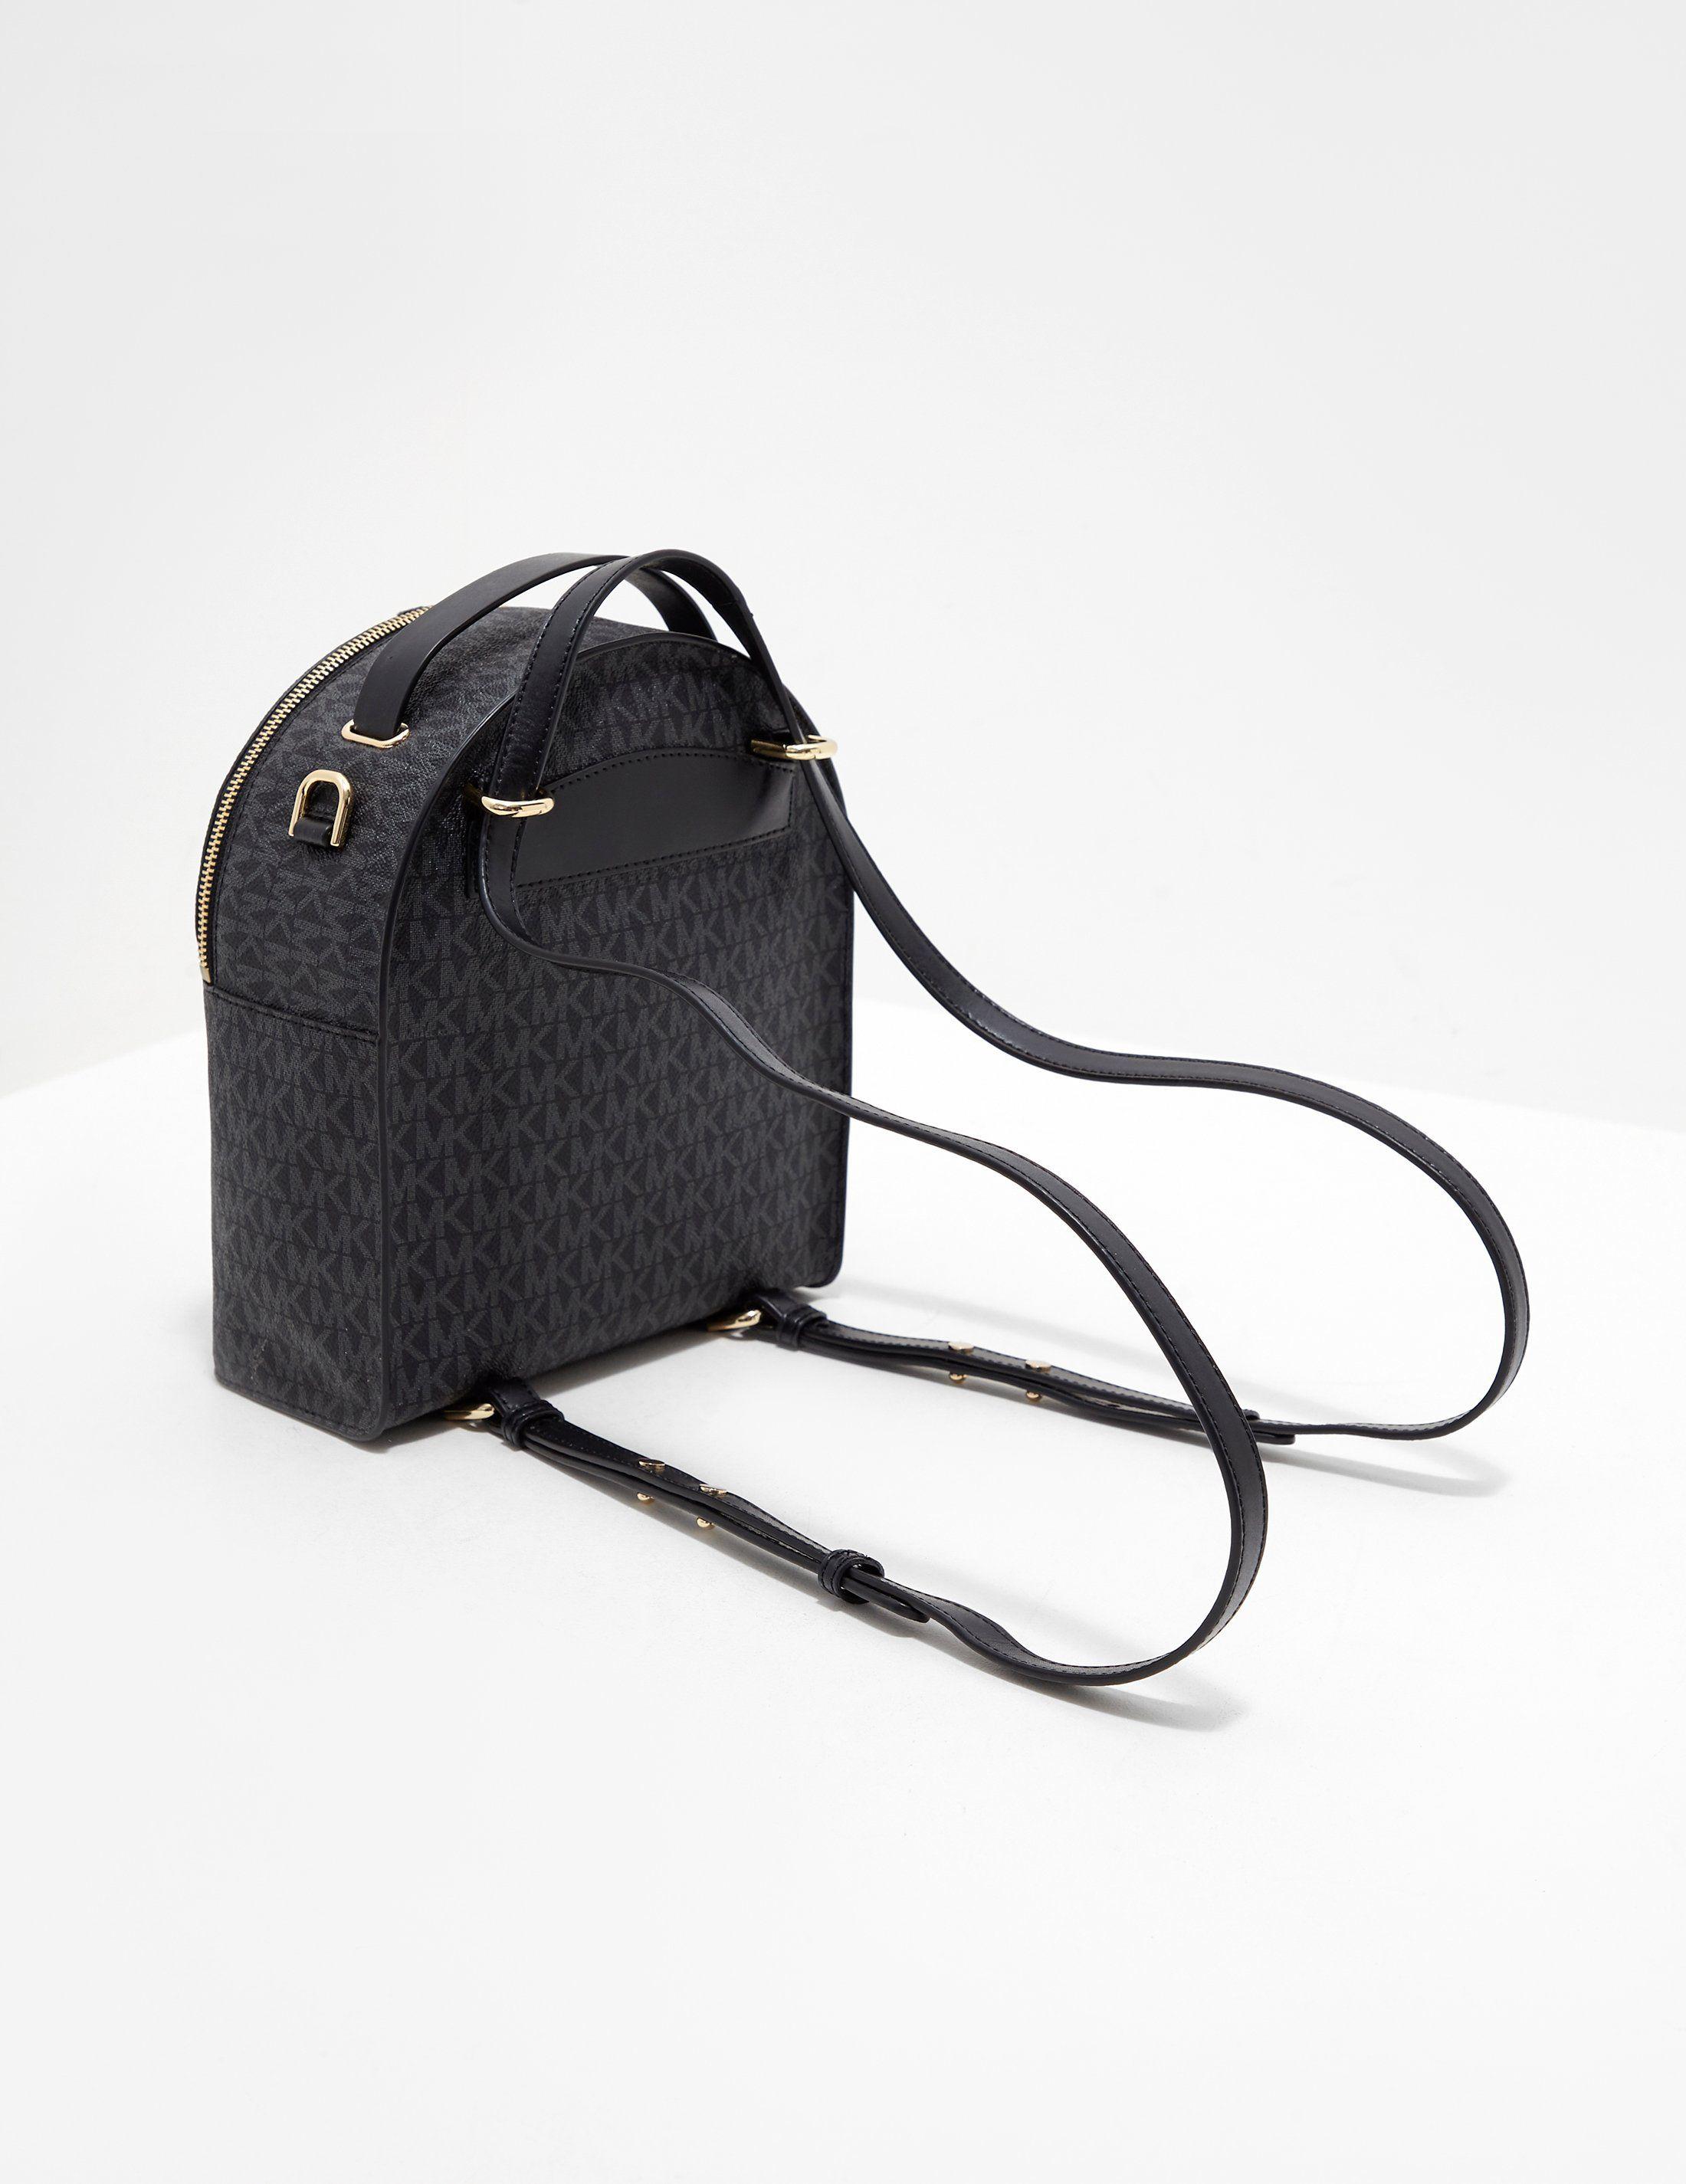 Michael Kors Jessa Small Backpack